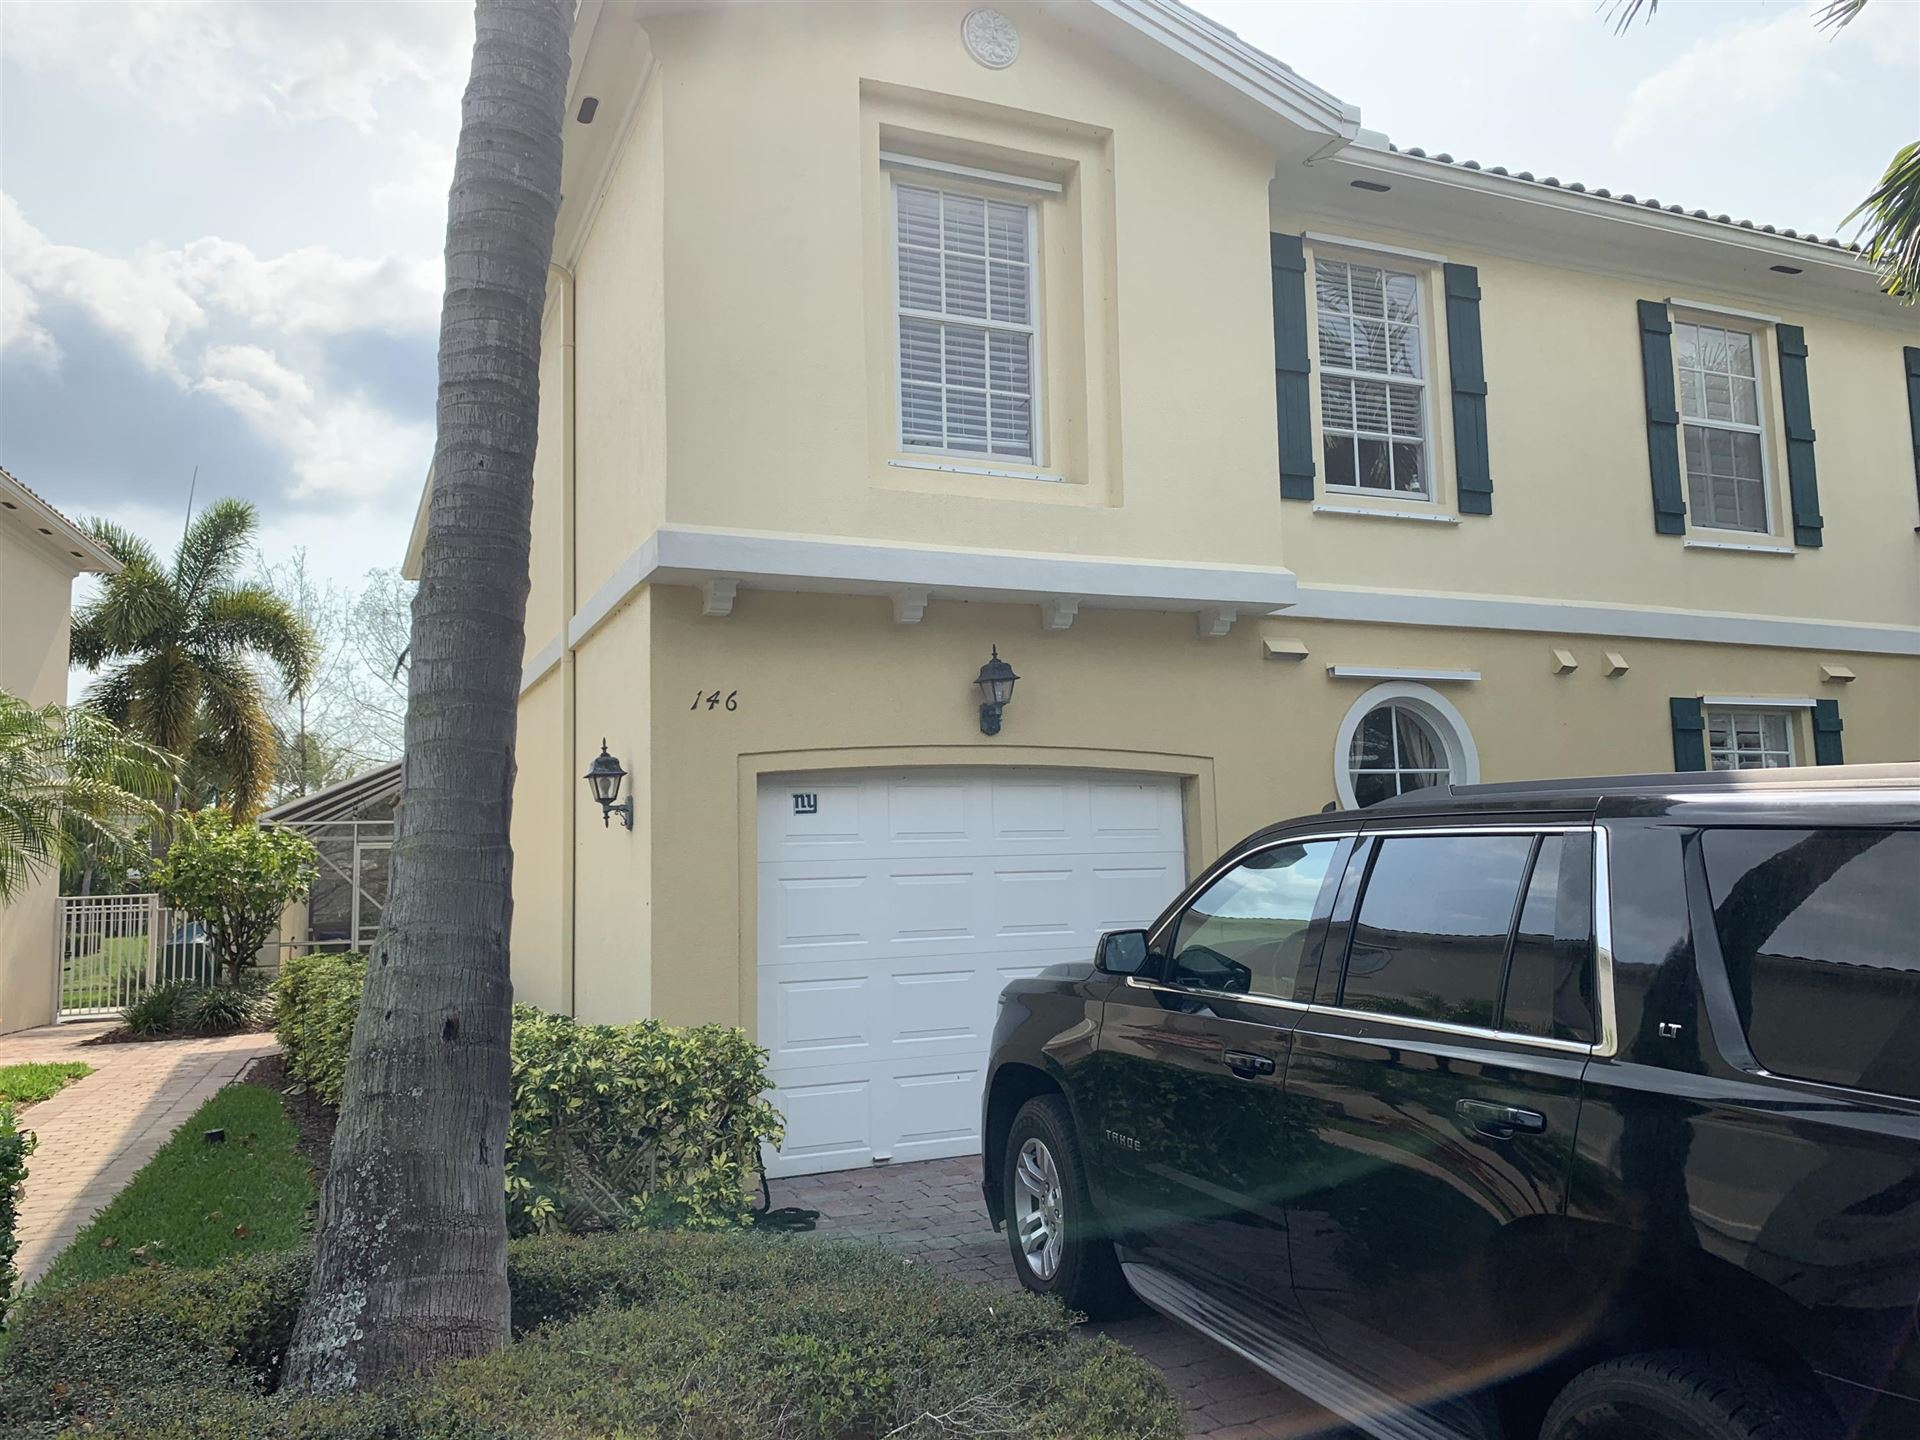 146 Santa Barbara Way, Palm Beach Gardens, FL 33410 - #: RX-10616014